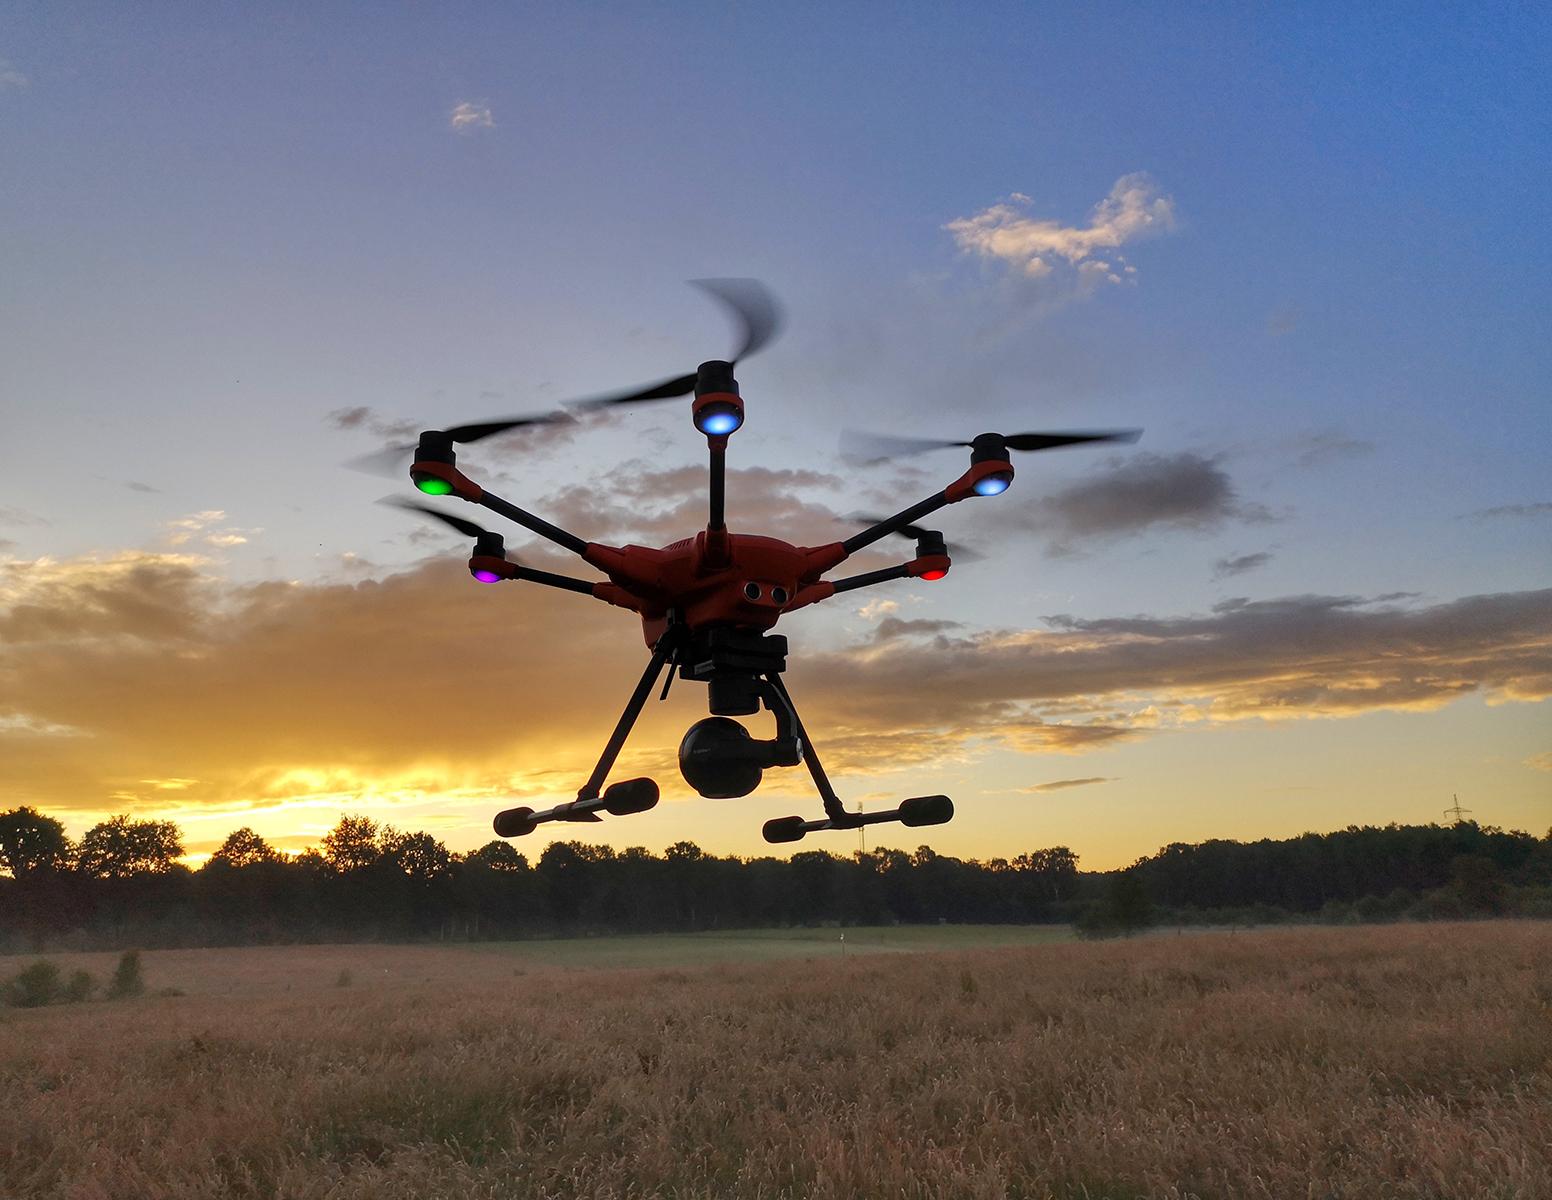 Rehkitzsuche per Drohne